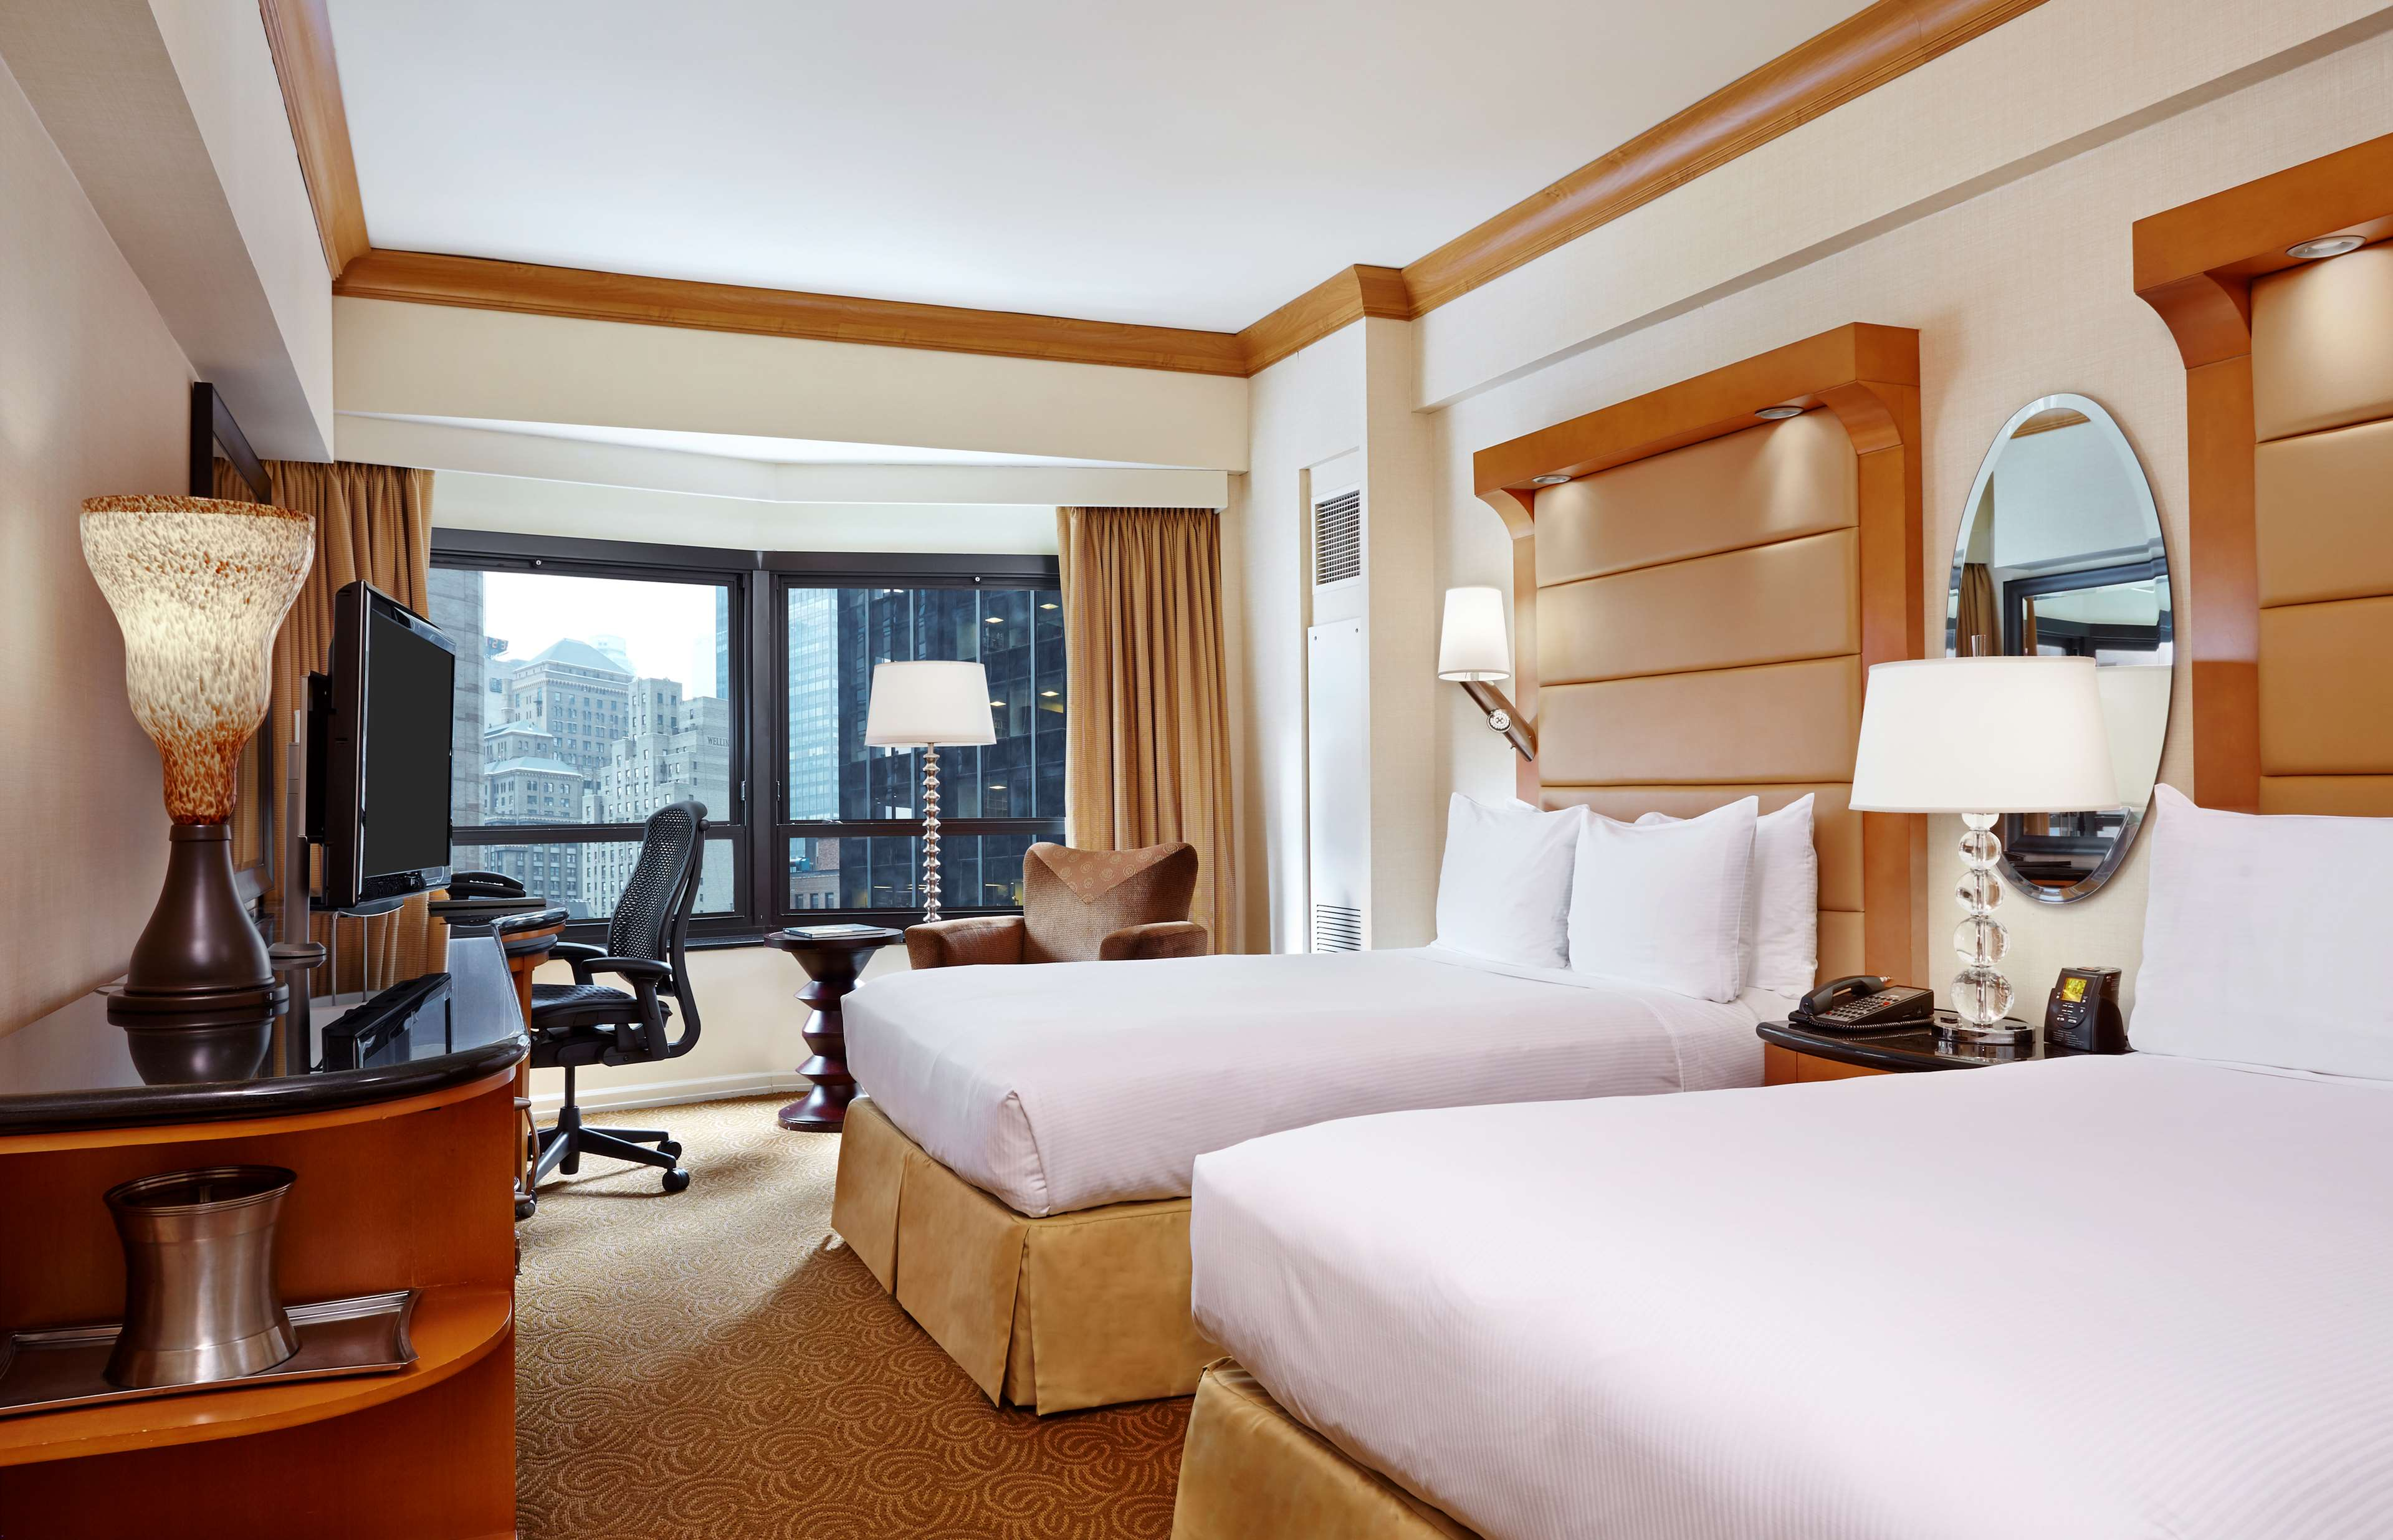 New York Hilton Midtown image 36